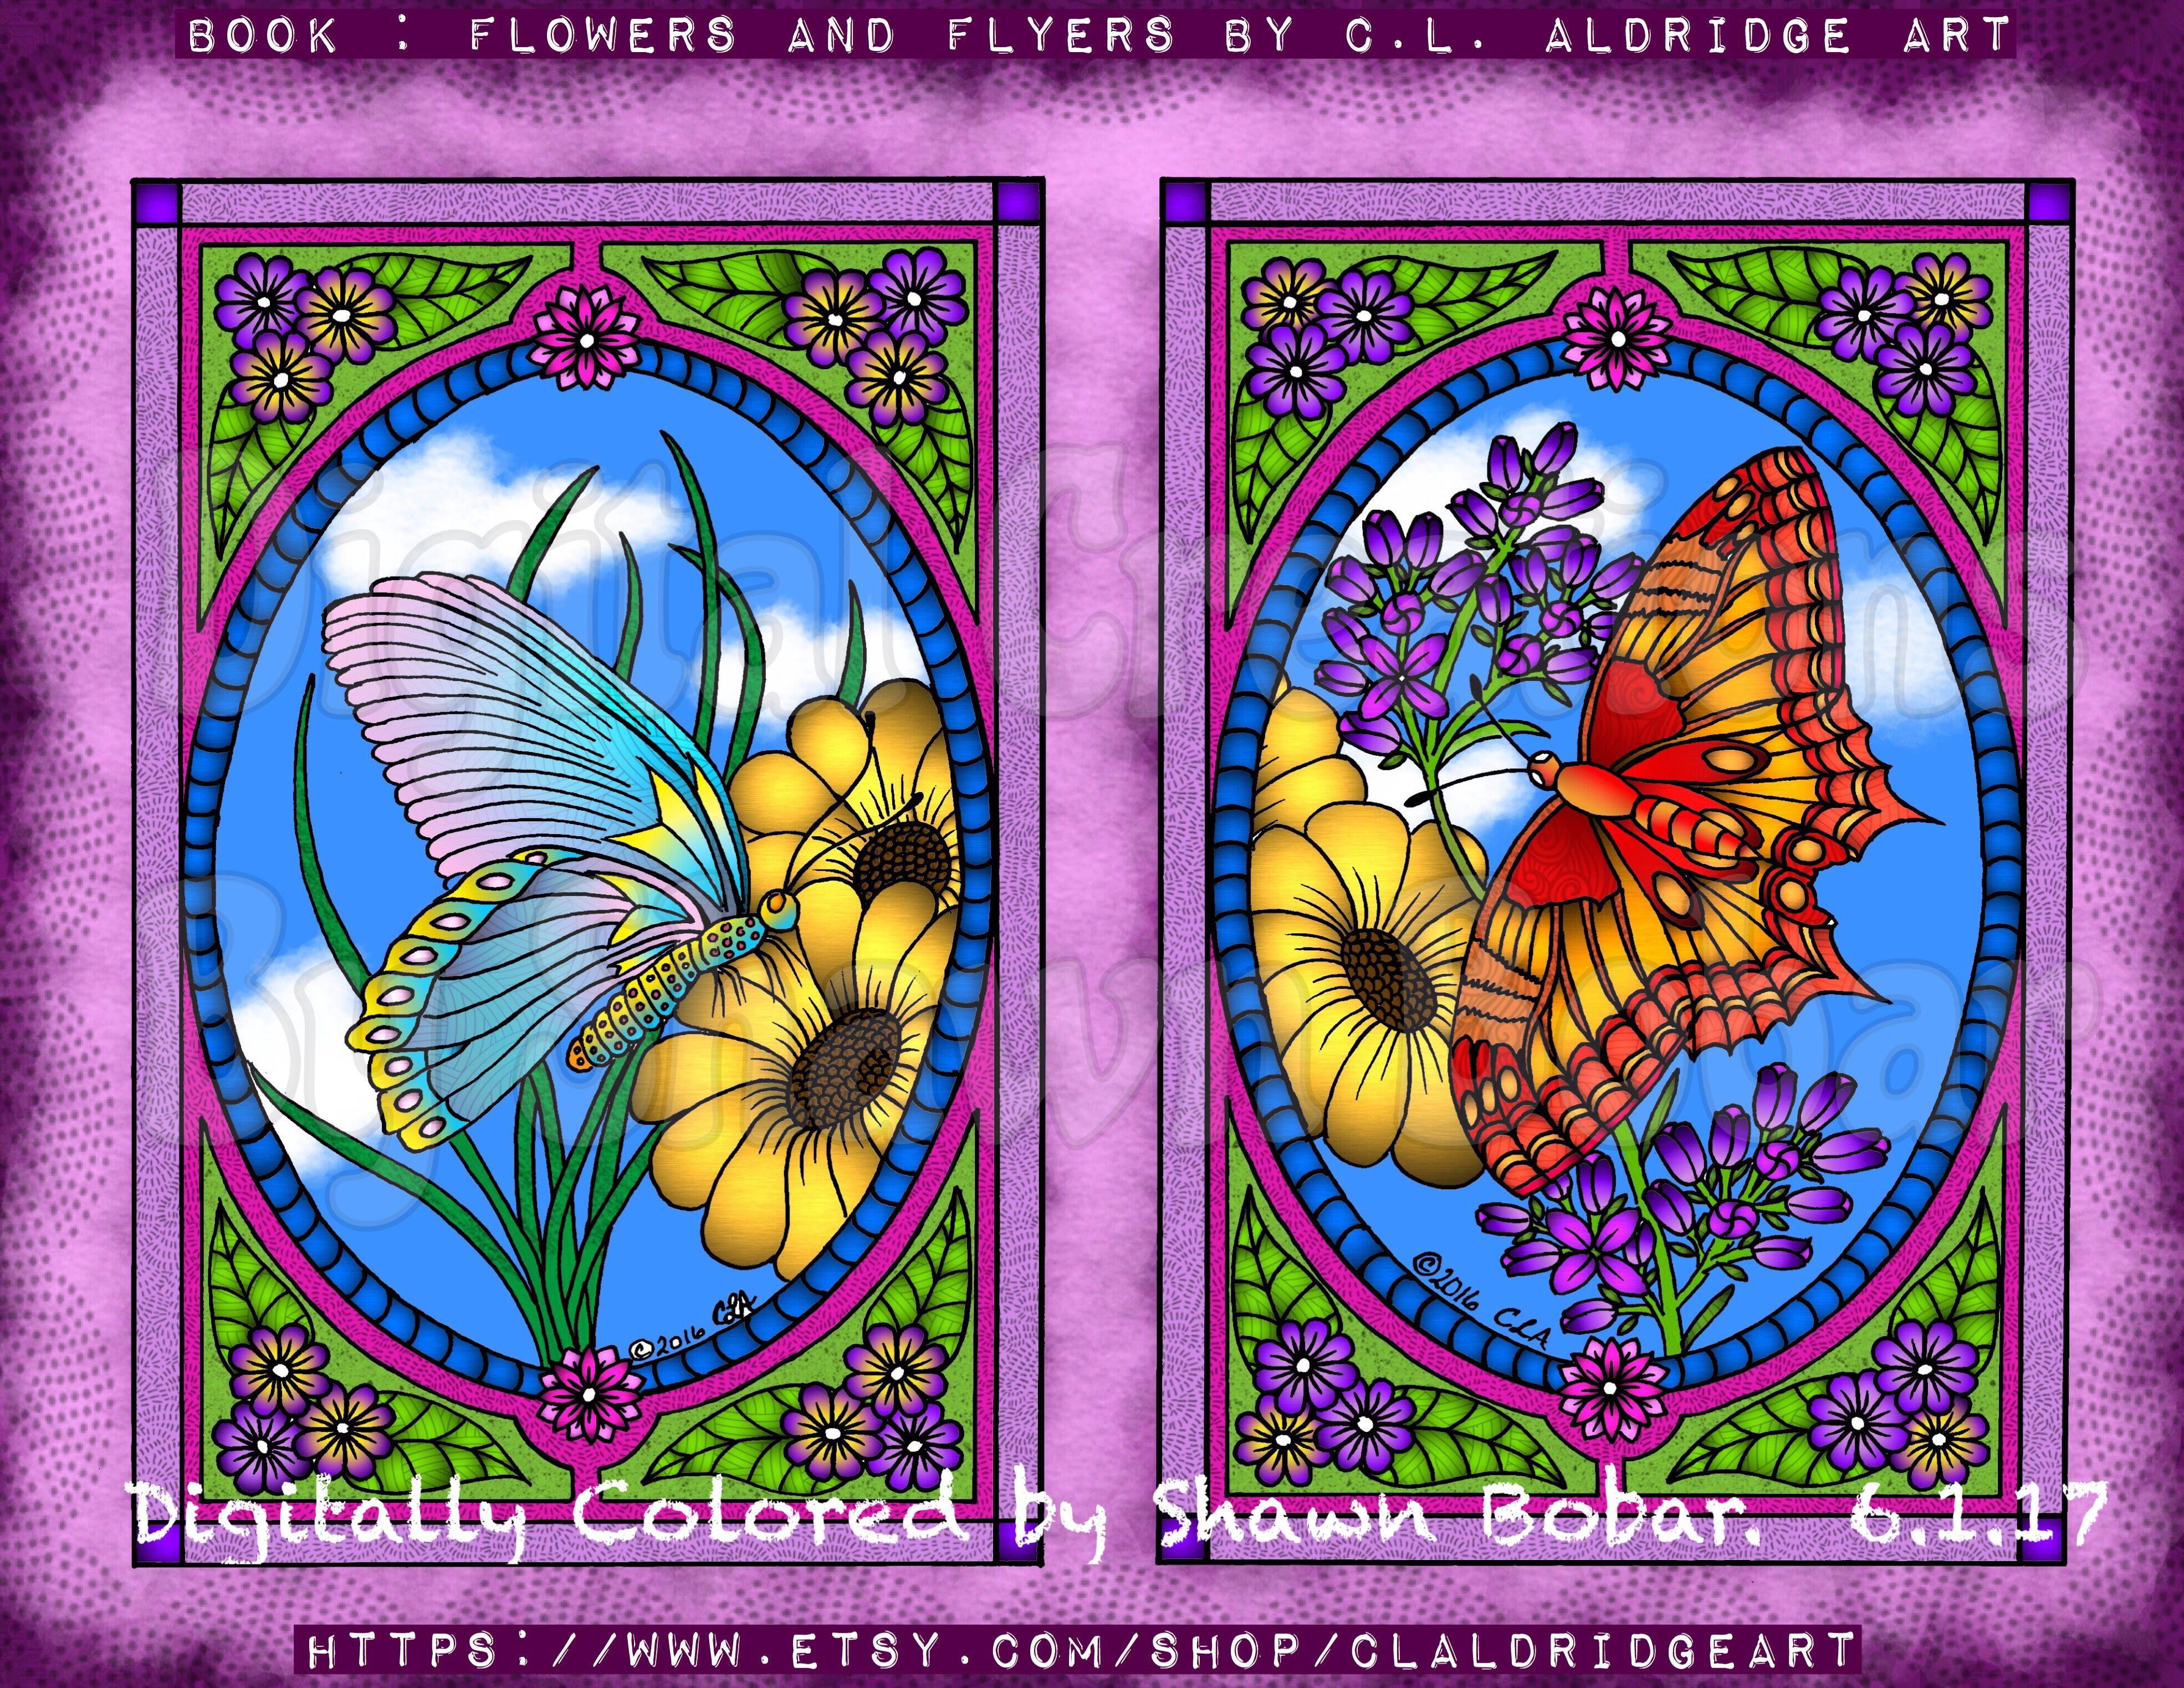 Aldridge Art Digital Creations By Shawn Bobar Digitally Colored Using Pigment IPad Pro Apple Pen